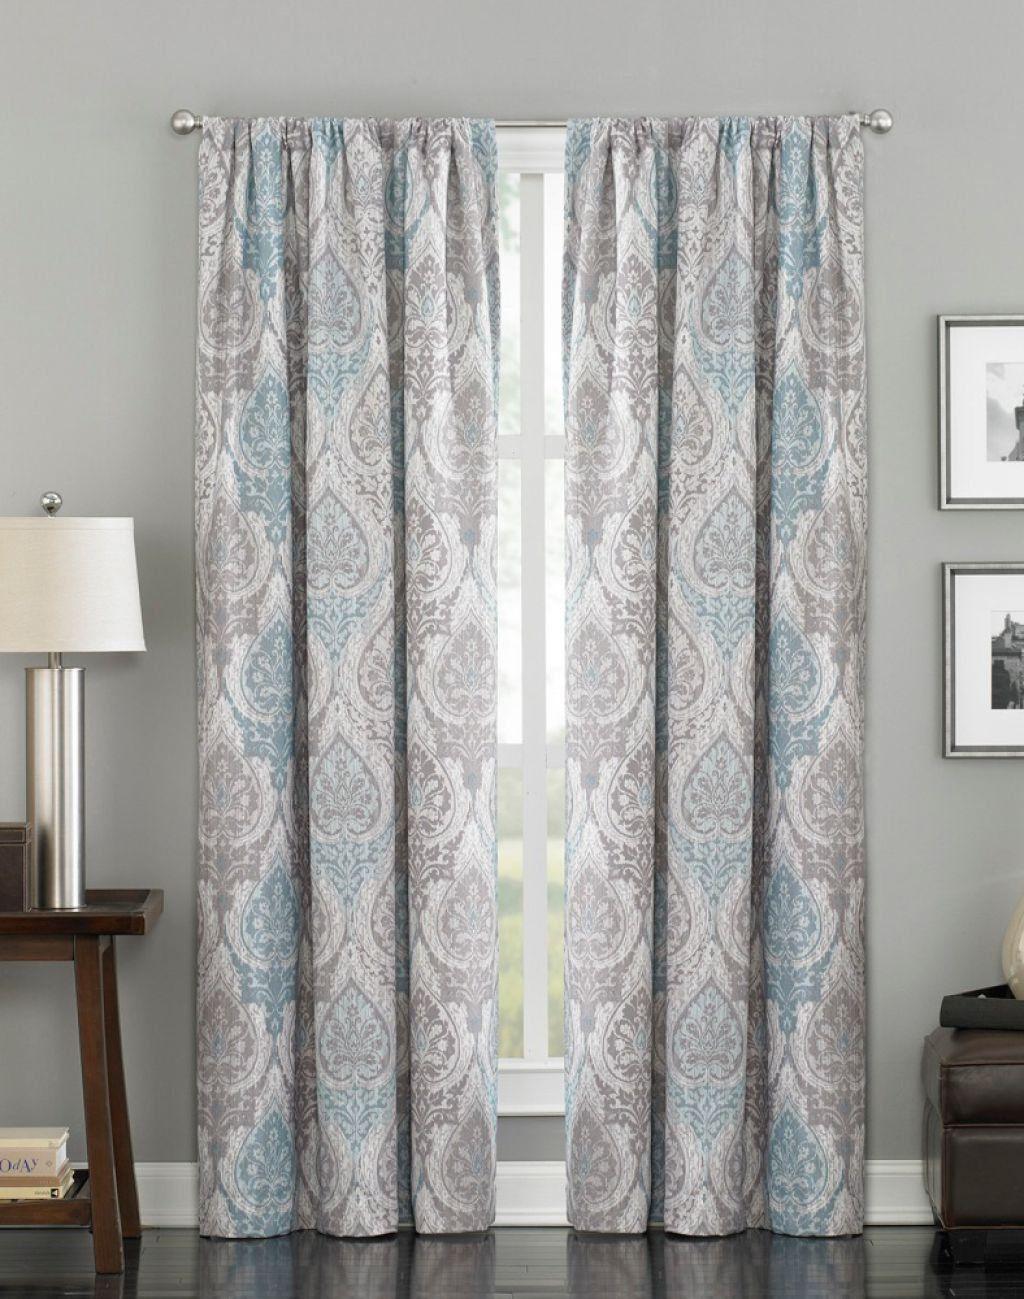 Stunning And Elegant Damask Curtains Curtains For Grey Walls Damask Curtains Grey Walls Living Room